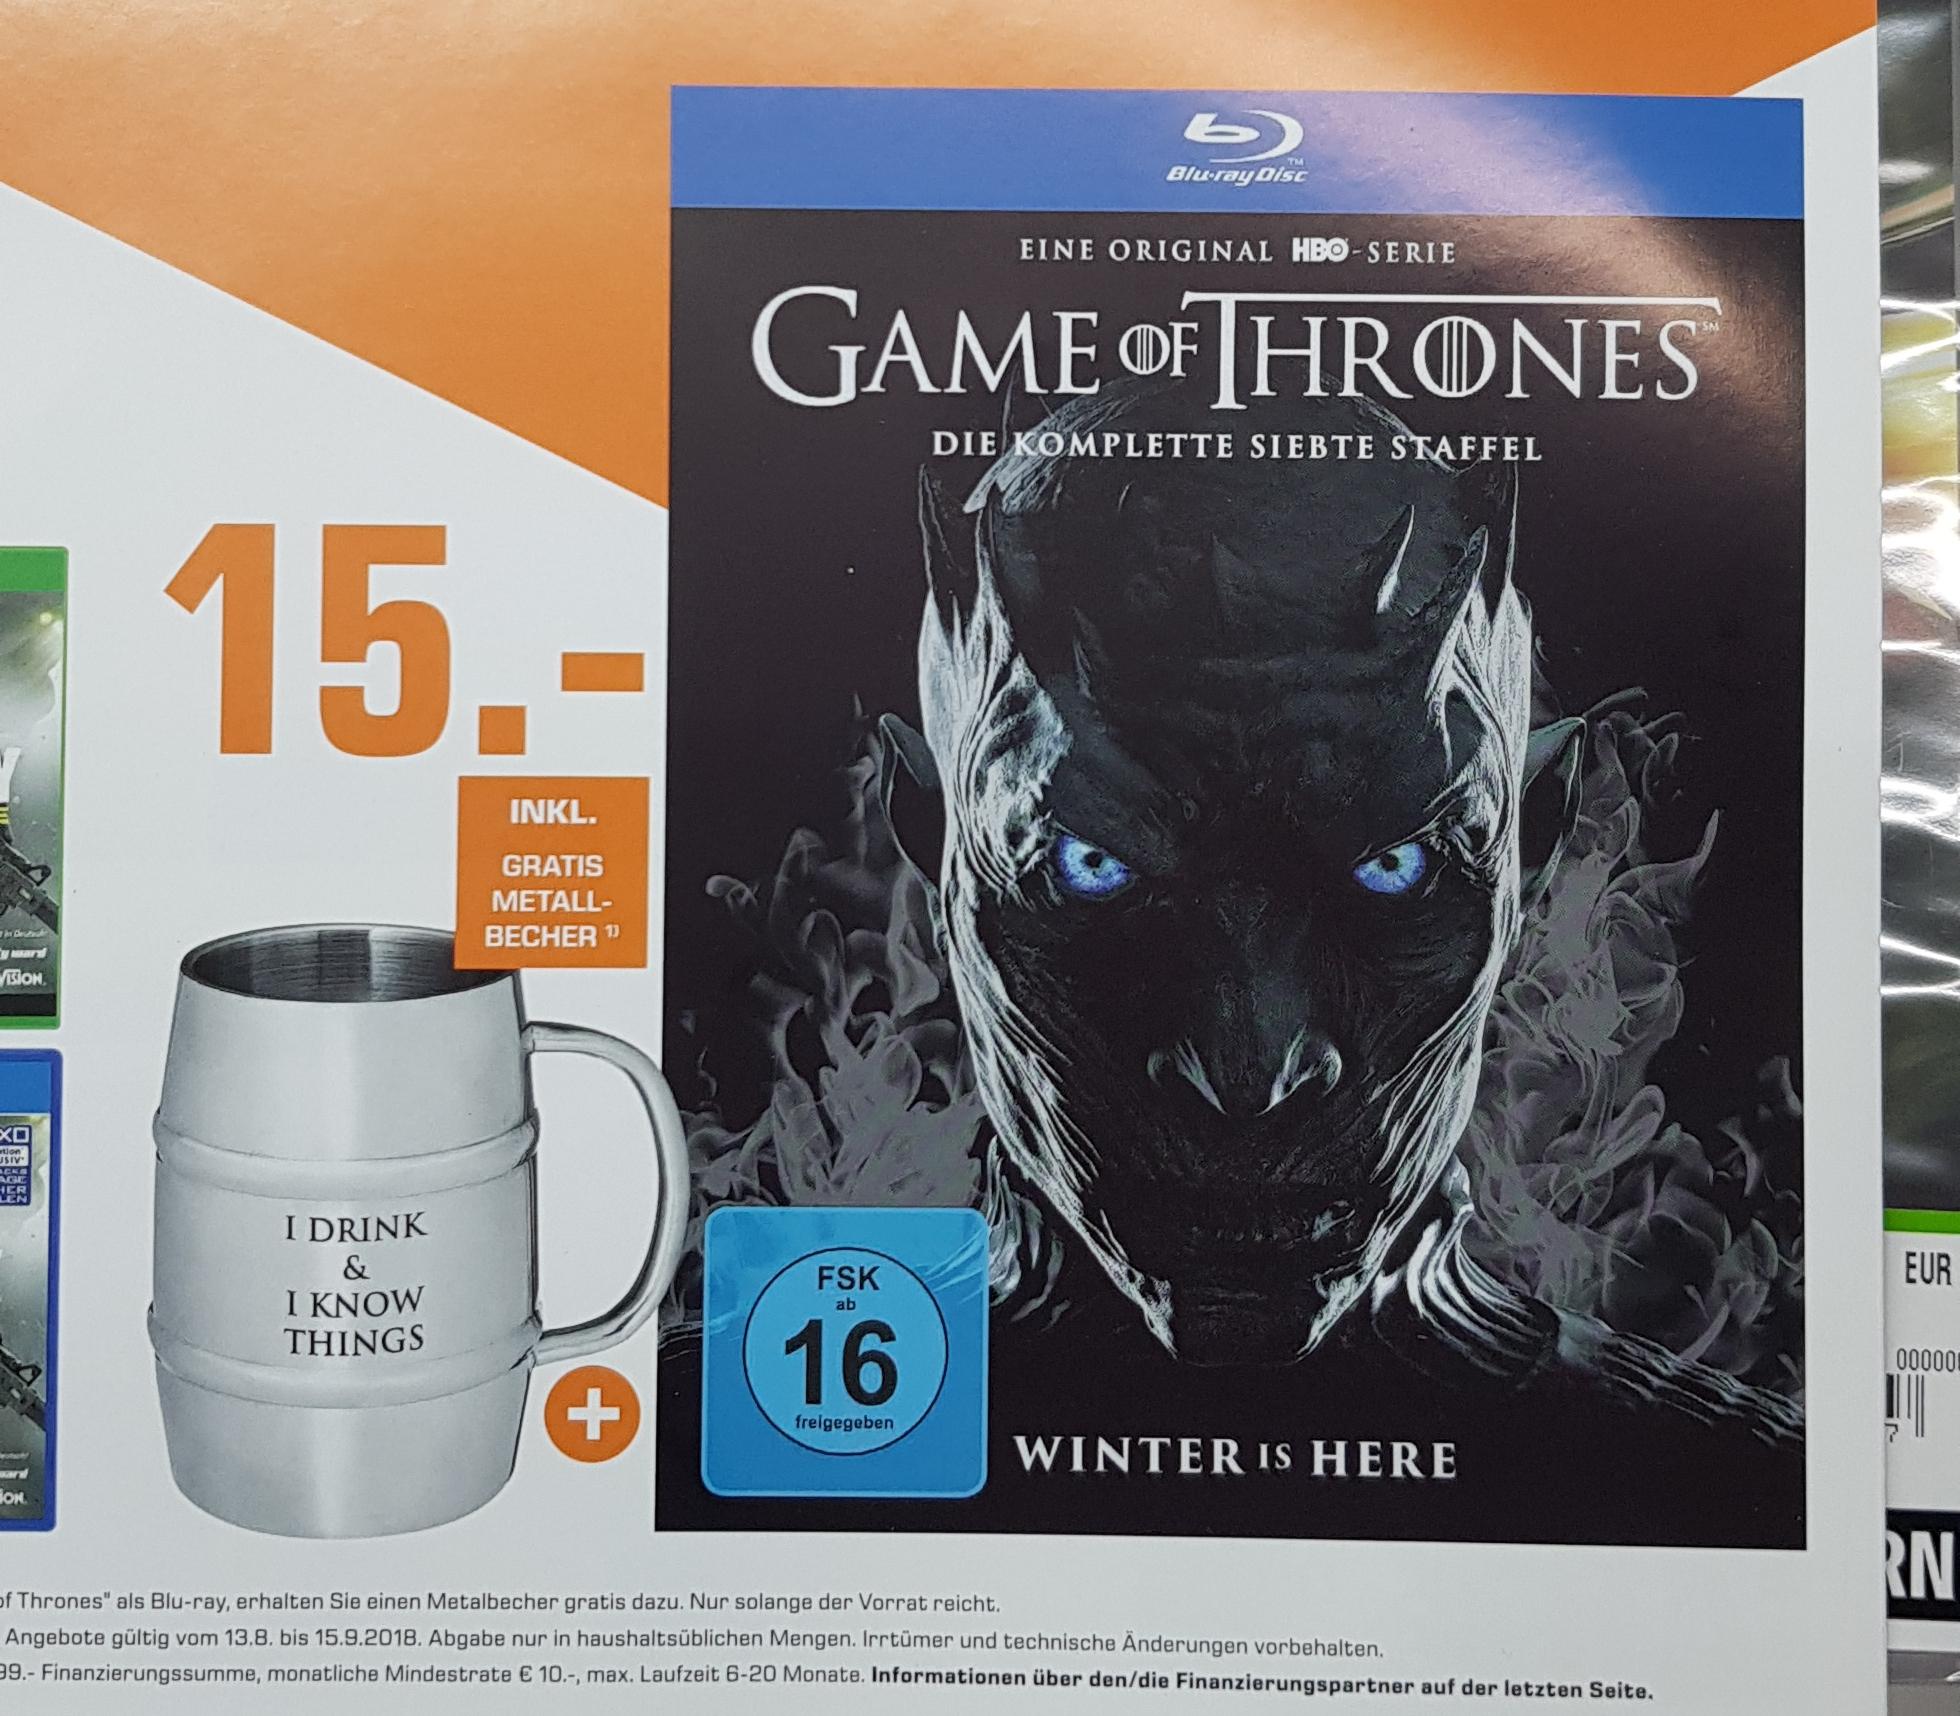 [Lokal] Saturn Berlin Game of Thrones Staffel 7 Blu-ray inkl. Metall-Becher